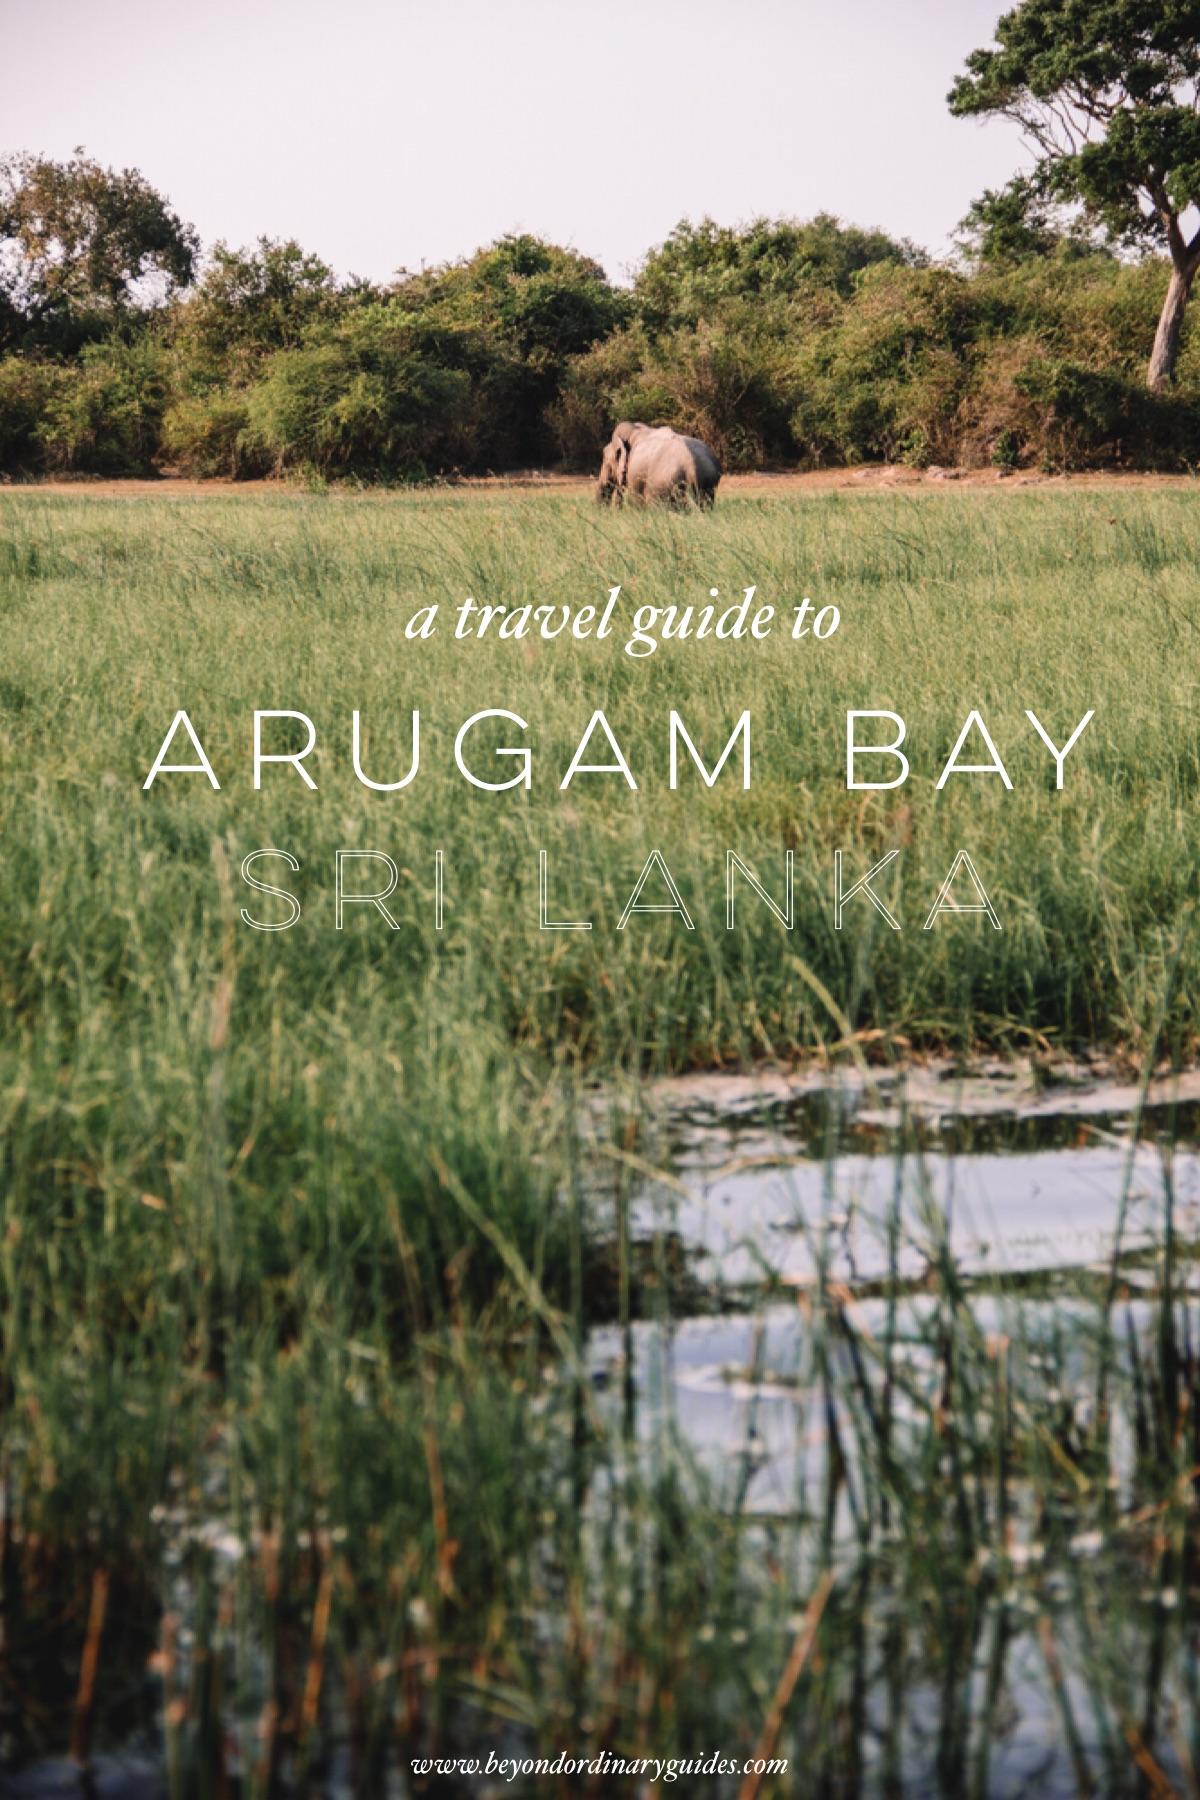 Travel Guide to Arugam Bay, Sri Lanka.jpg